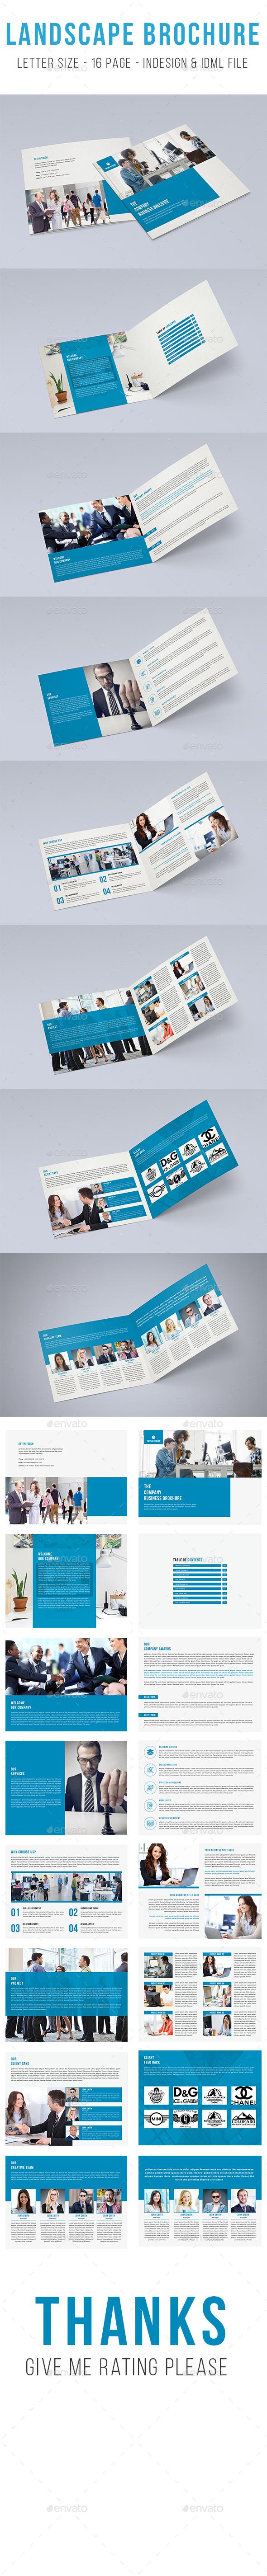 Brochure Indesign Tamplate - Brochures Print Templates